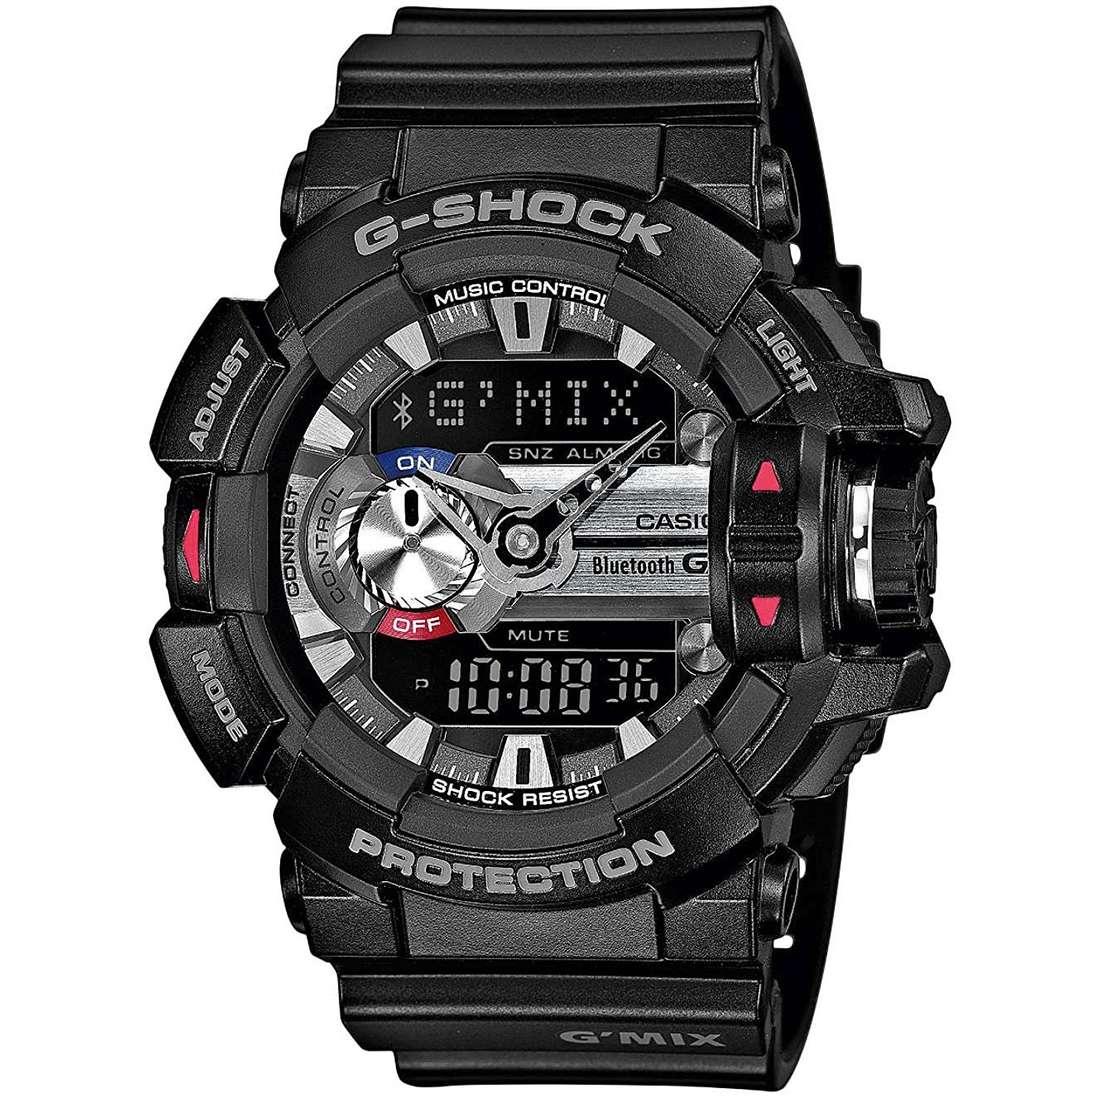 Orologio Digitale Uomo Casio G-Shock GBA-400-1AER